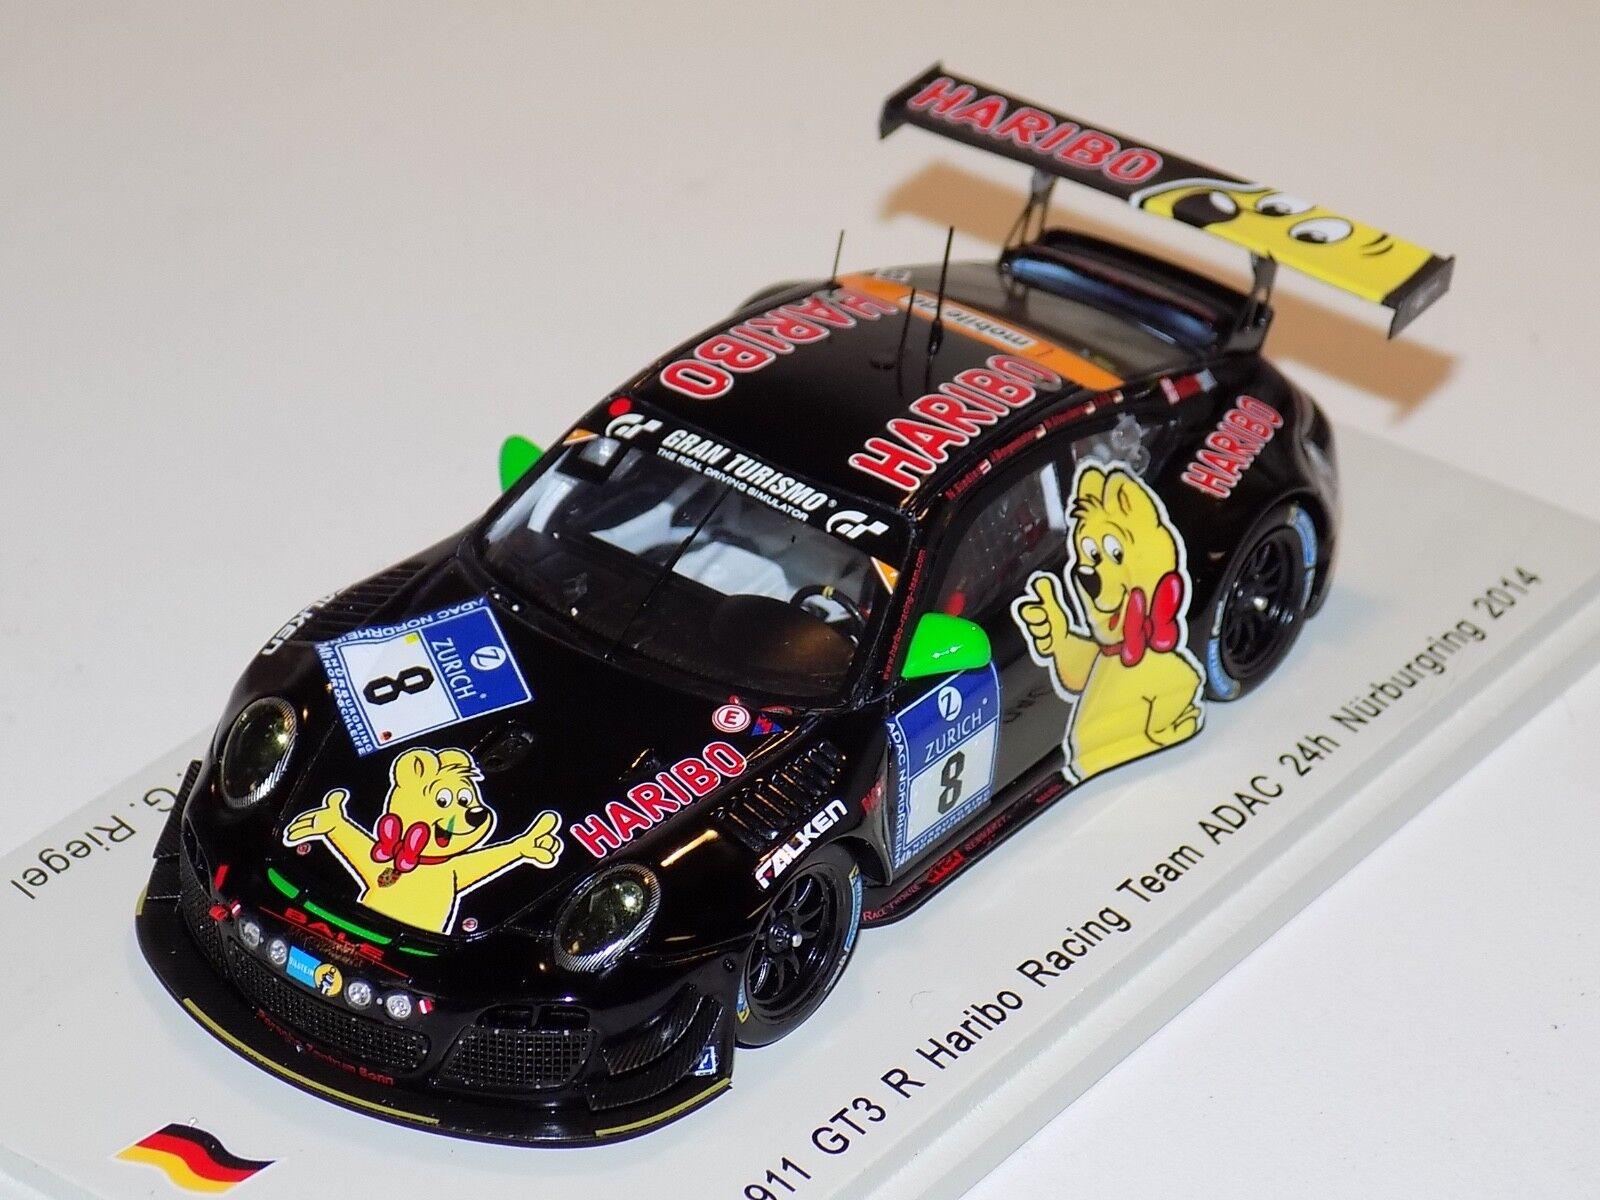 negozio di vendita outlet 1 43 Spark Porsche 911 GT3 R auto    8 24 Hours of Nurburgring 2014  SG146  vendita scontata